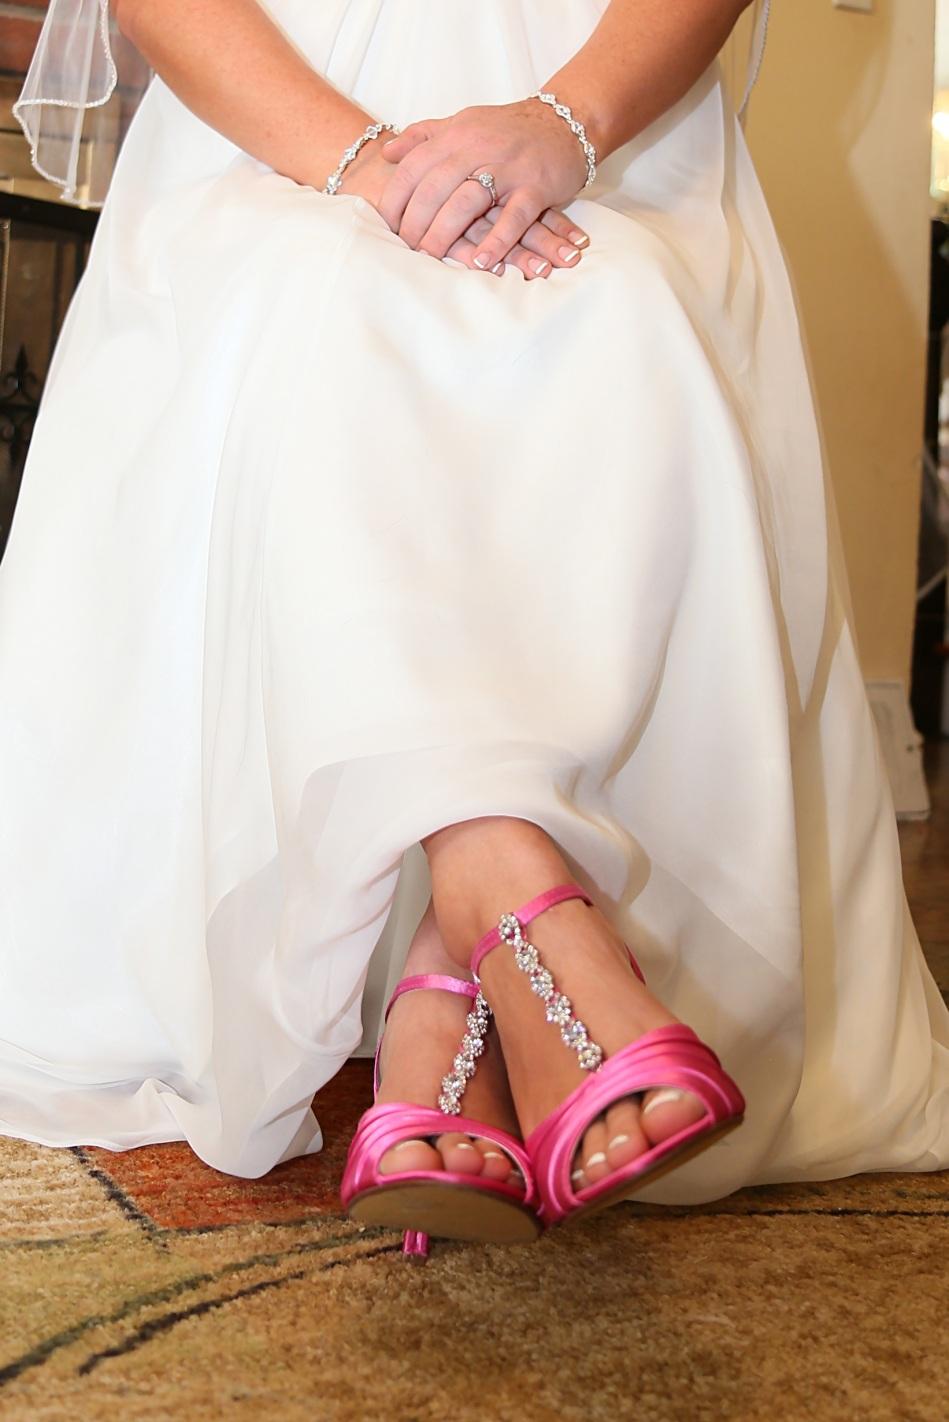 #bridetobe, #njwedding, #apicturesquememoryphotography, #weddings, #pomptonlakesnjwedding, #bridalprep, #bridesheels